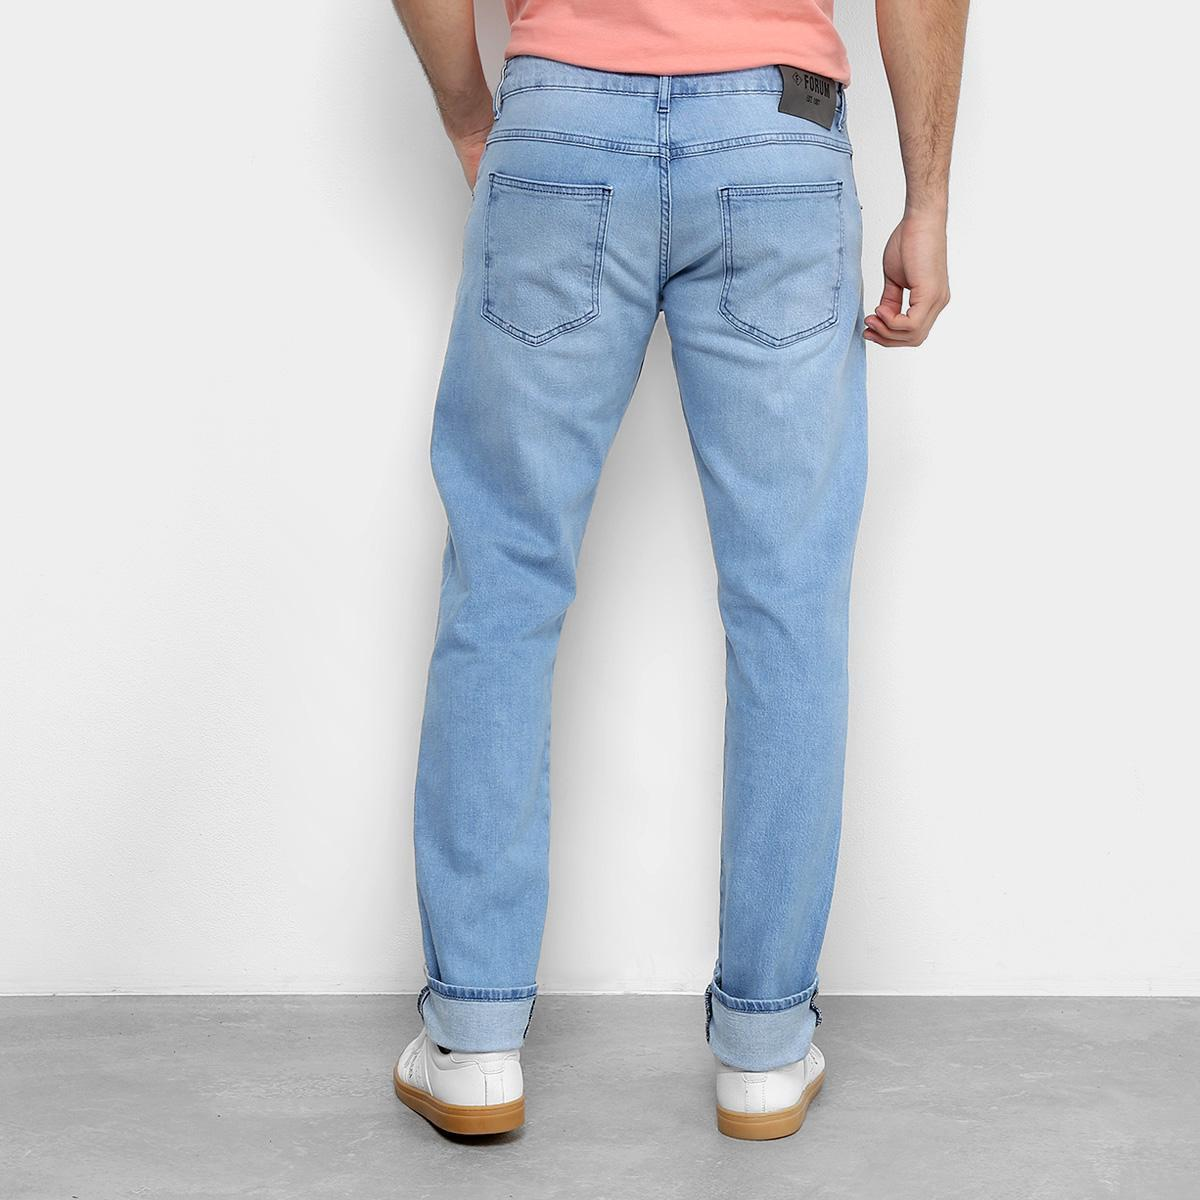 8b401b7b Calça Jeans Skinny Forum Igor Masculina